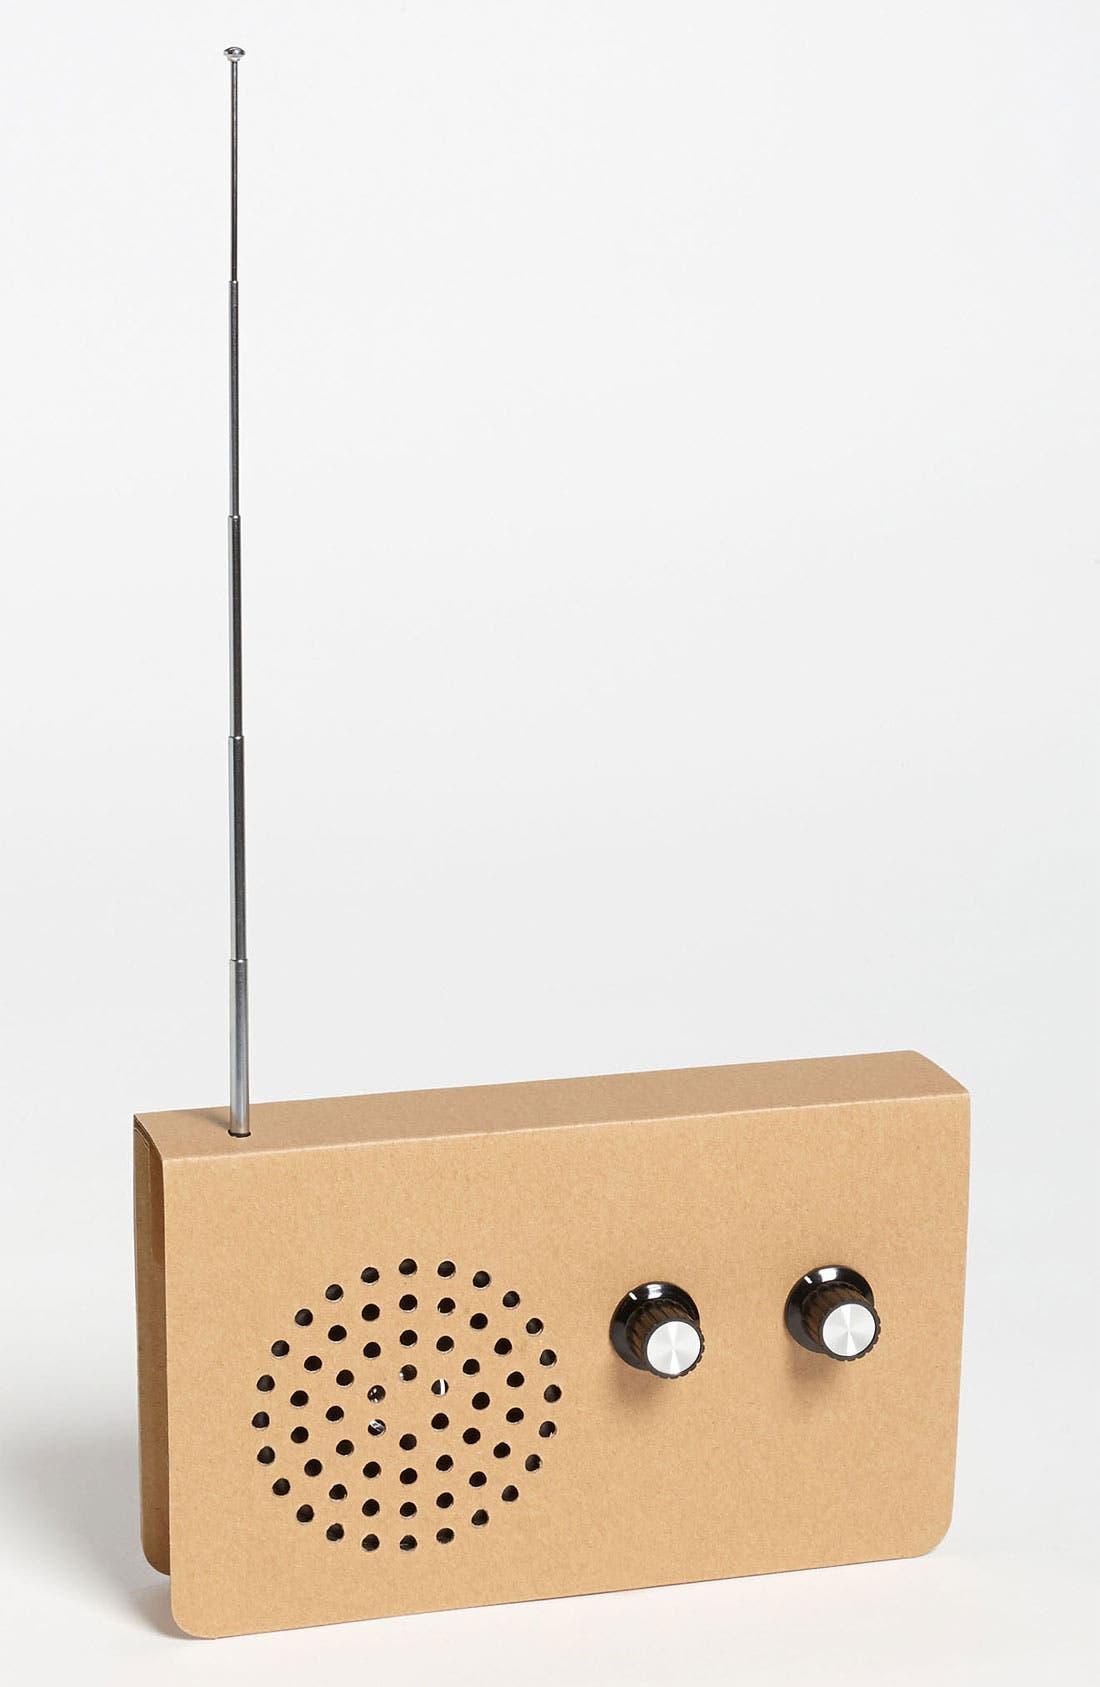 Main Image - Cardboard MP3 Player FM Radio